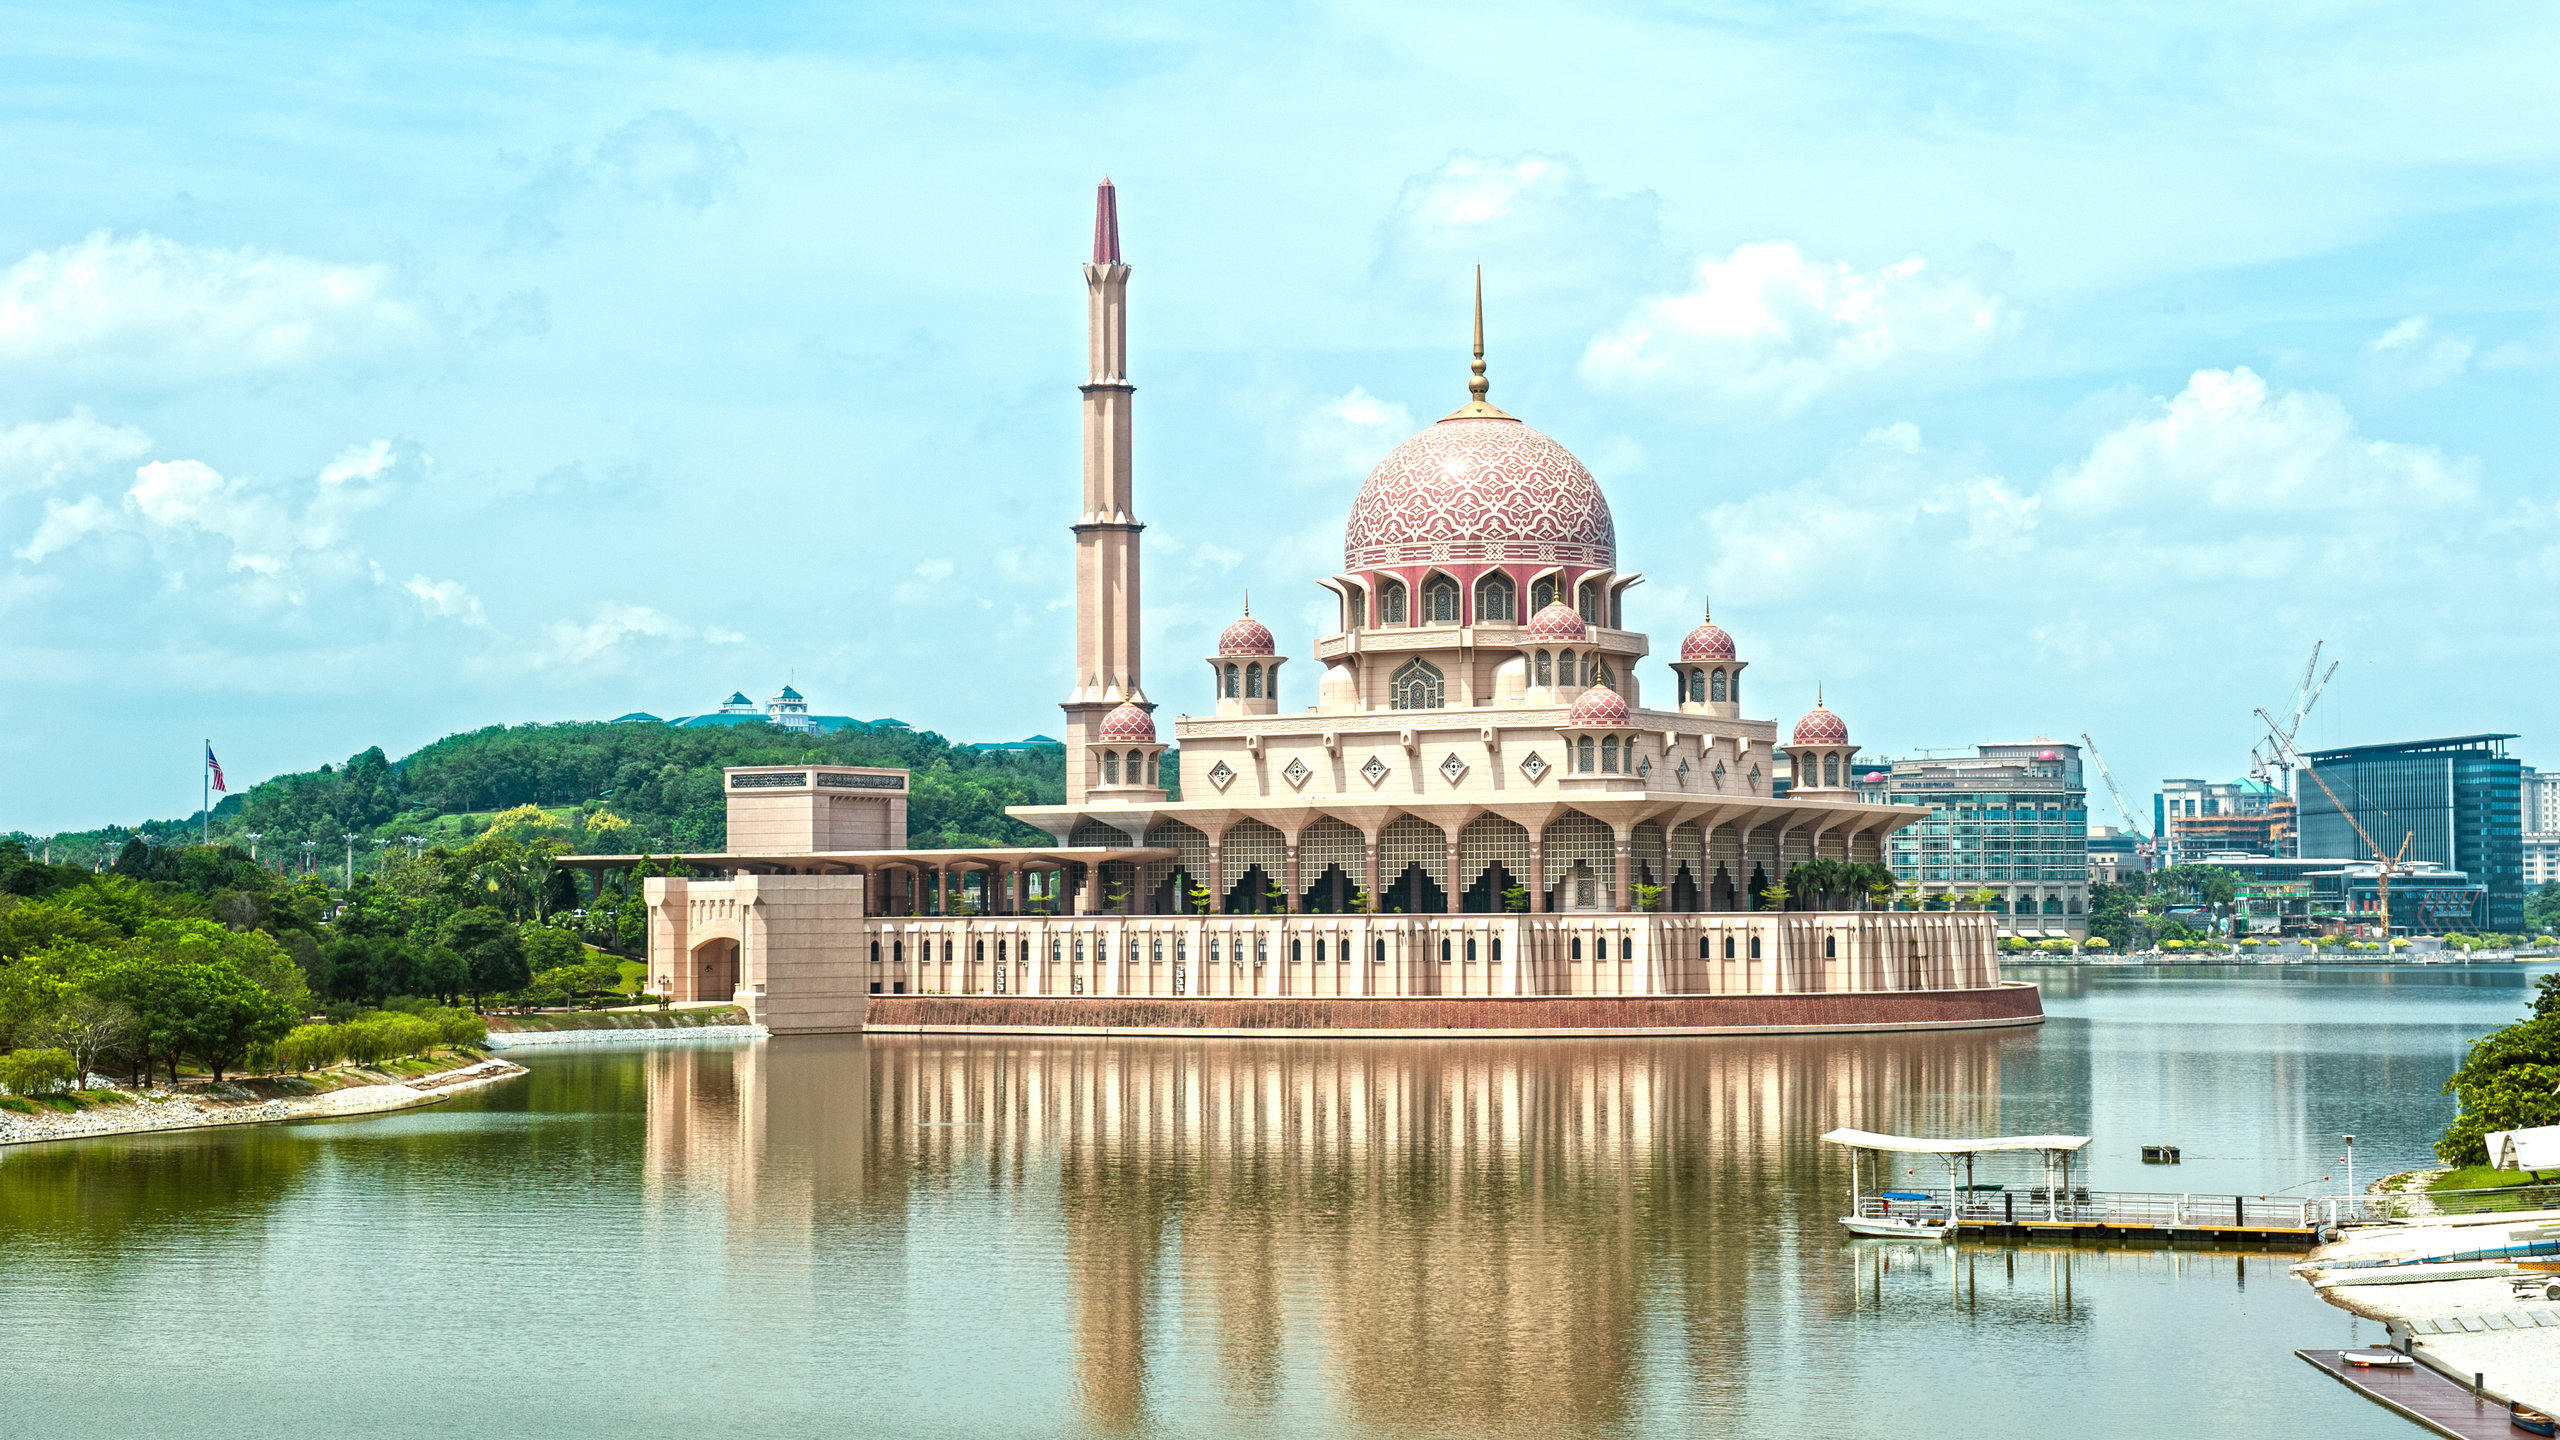 Putra Mosque, Putrajaya, Federal Territory of Putrajaya, Malaysia